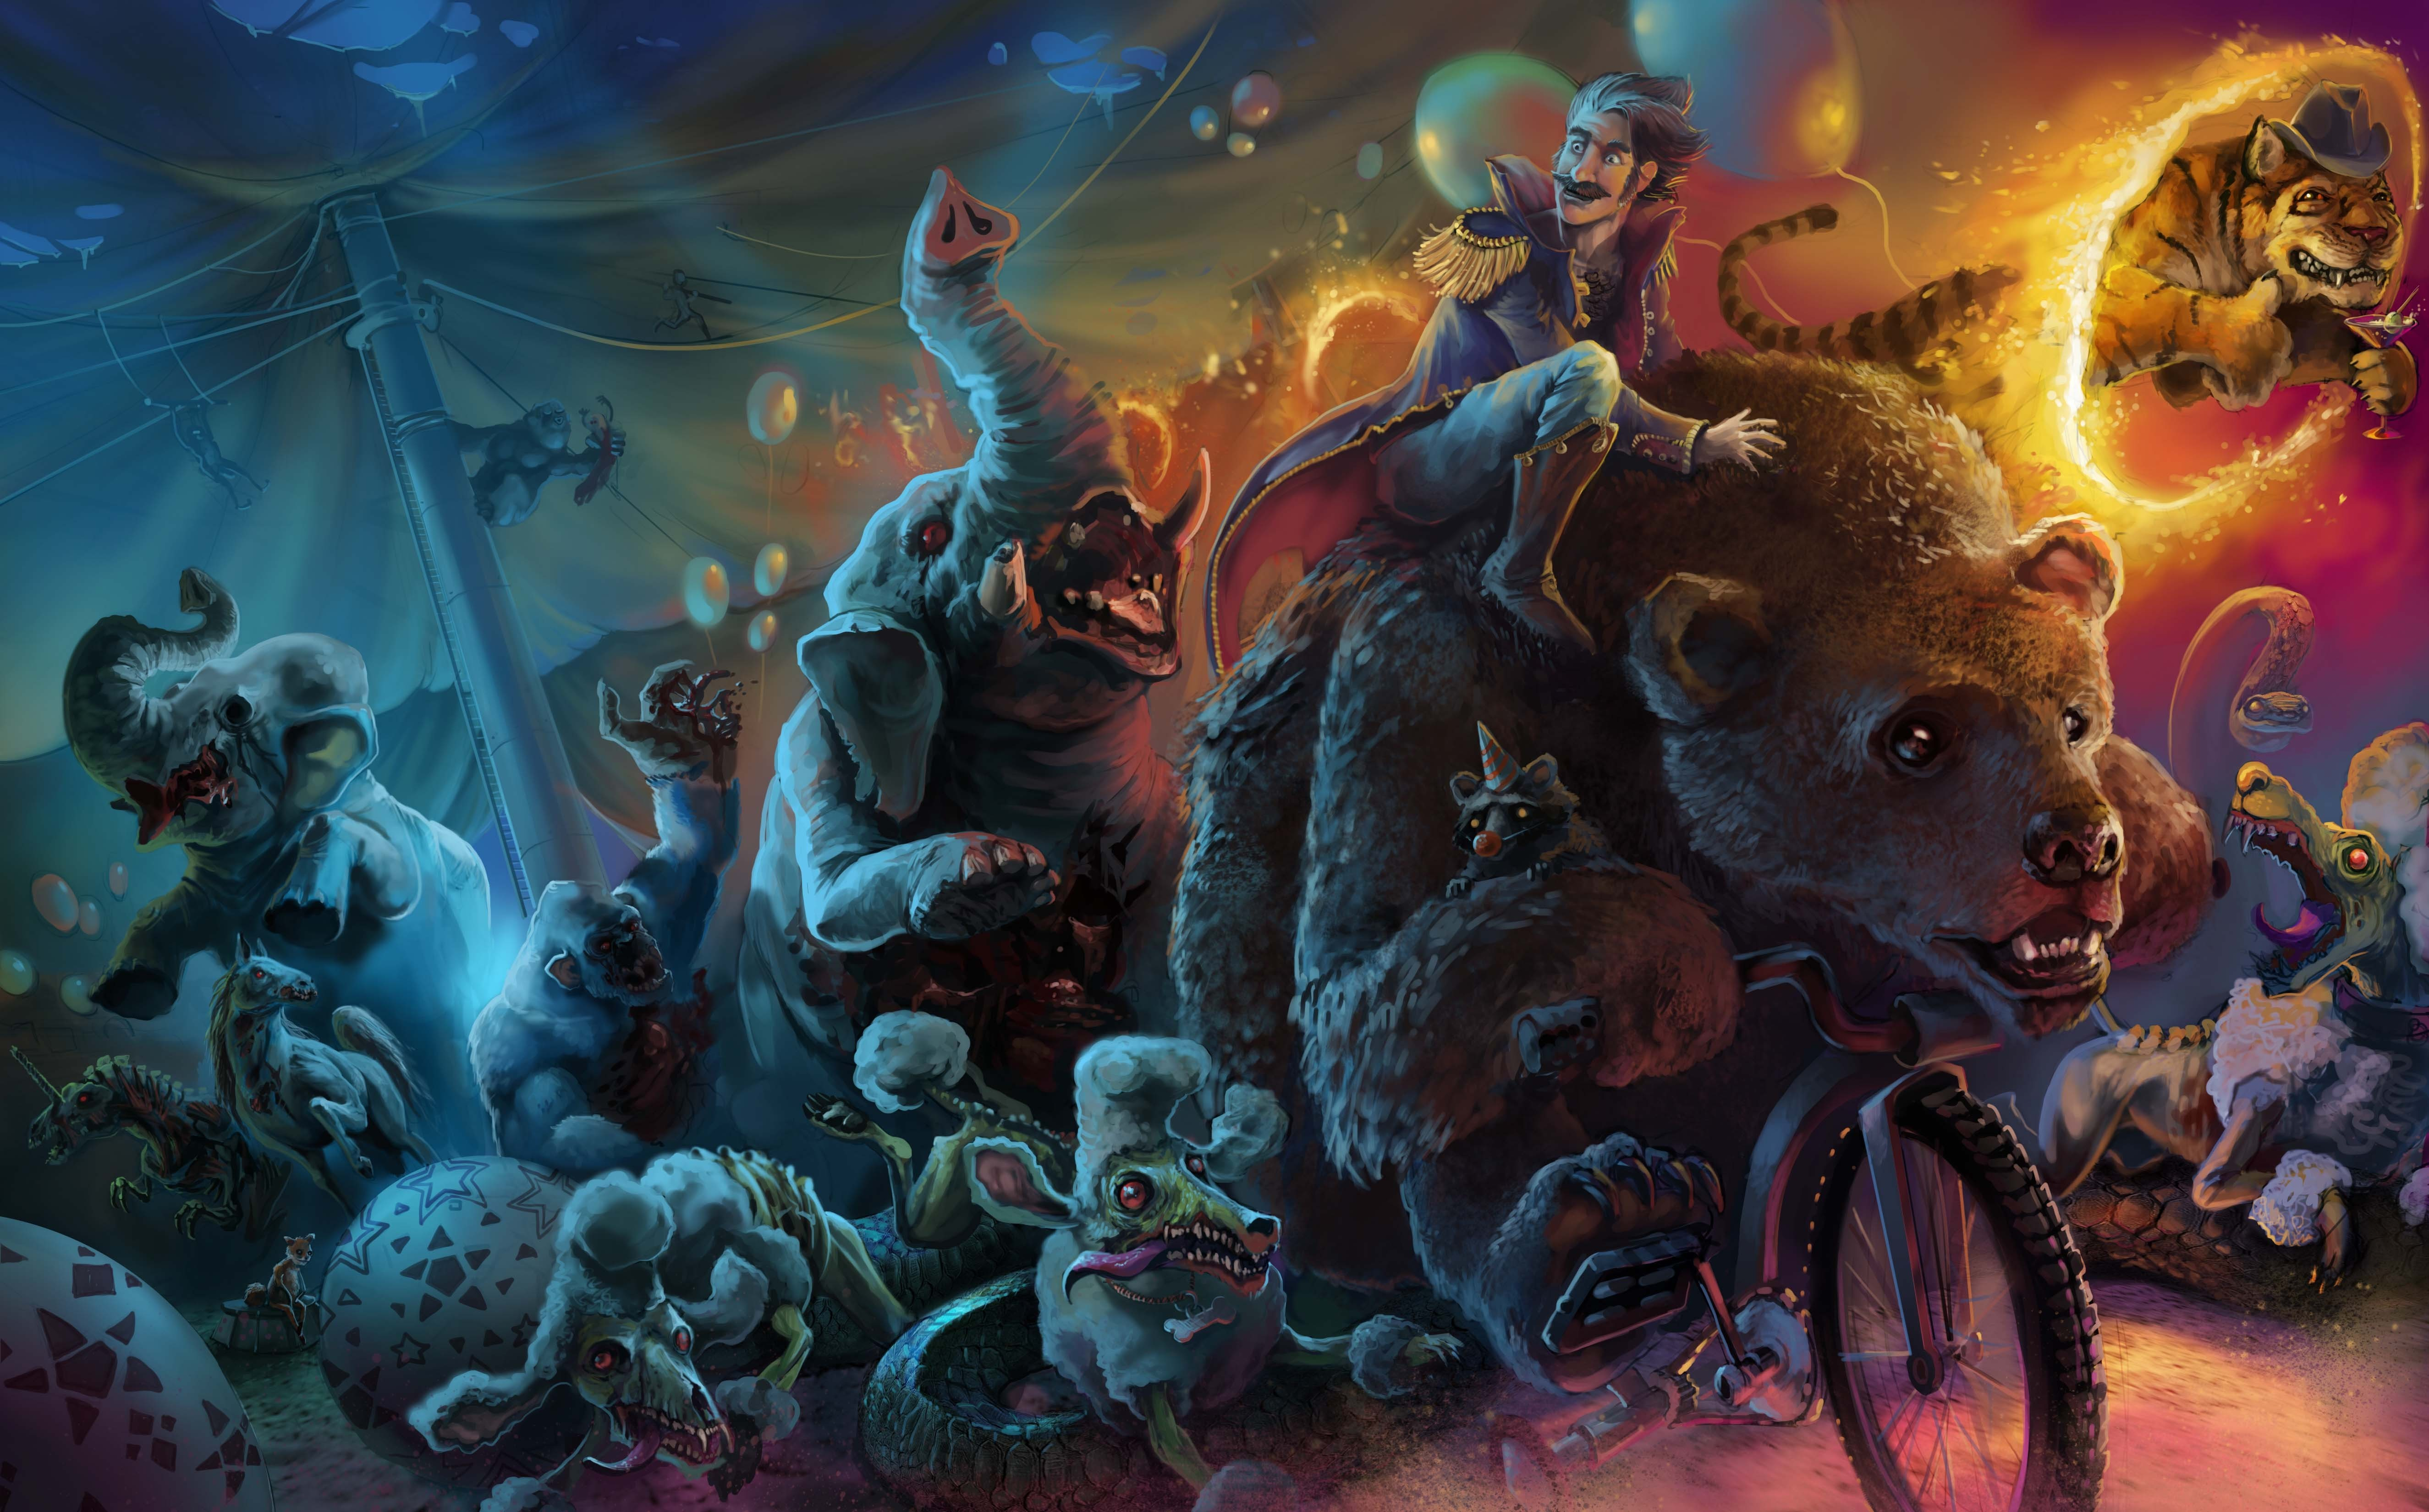 evil cartoon animals - HD5300×3300